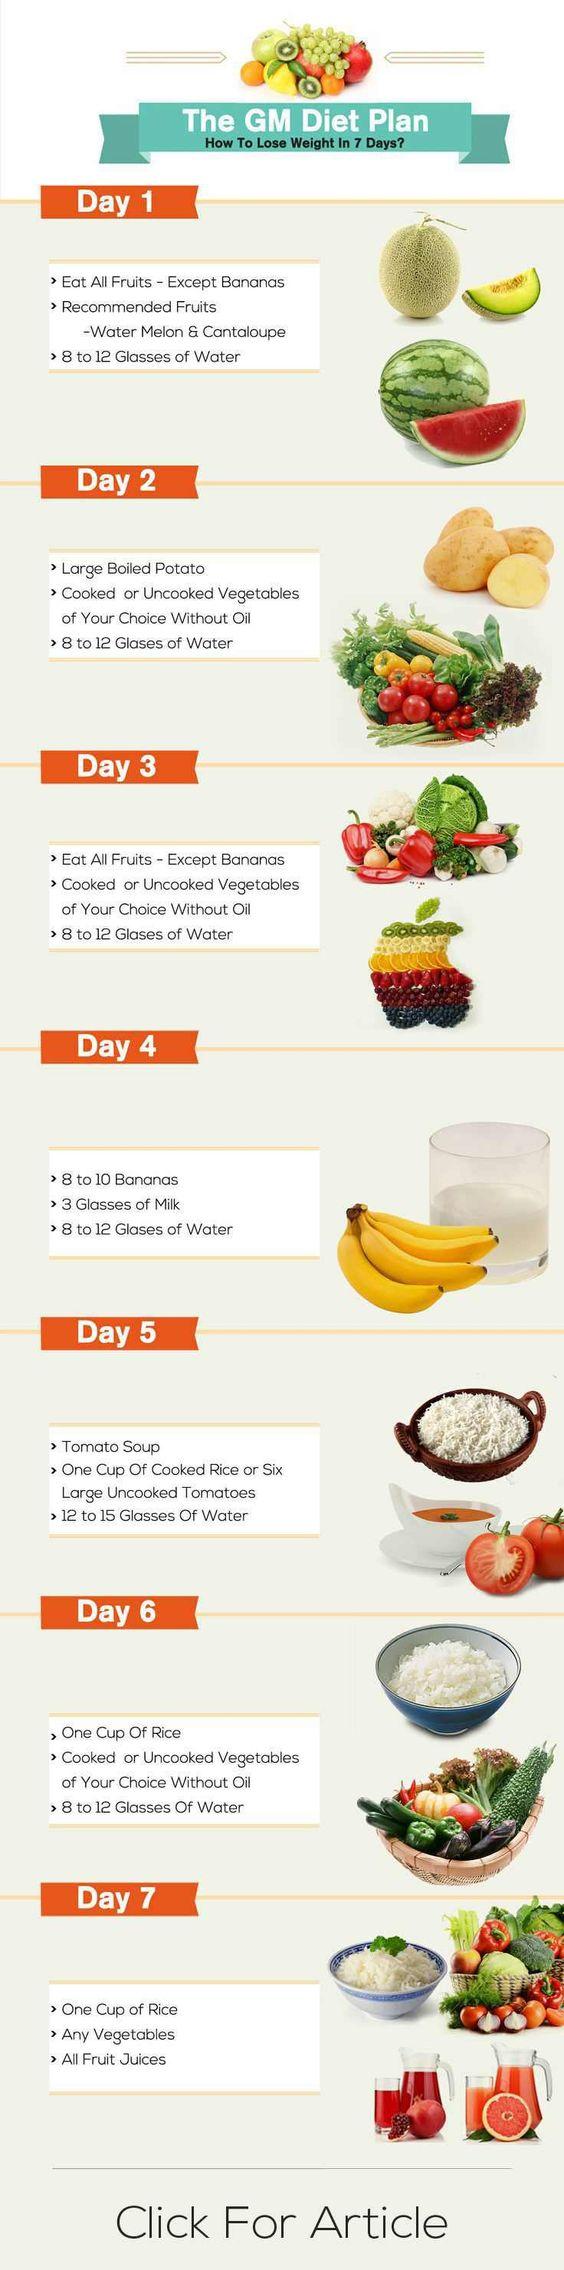 Gm Diet Diet Programs And Diet On Pinterest